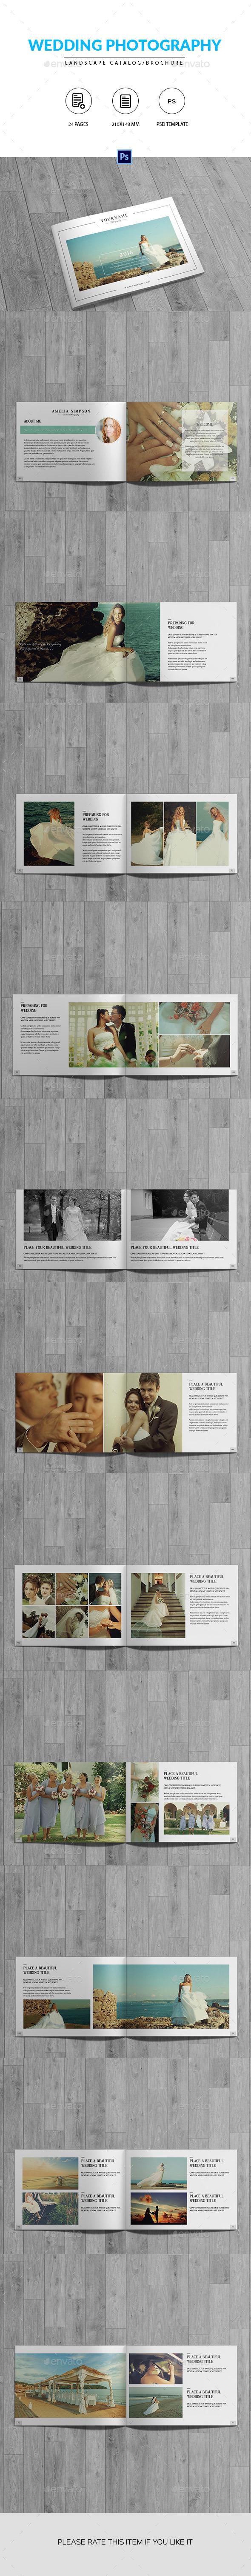 Wedding Photography Catalog/Brochure - Catalogs Brochures